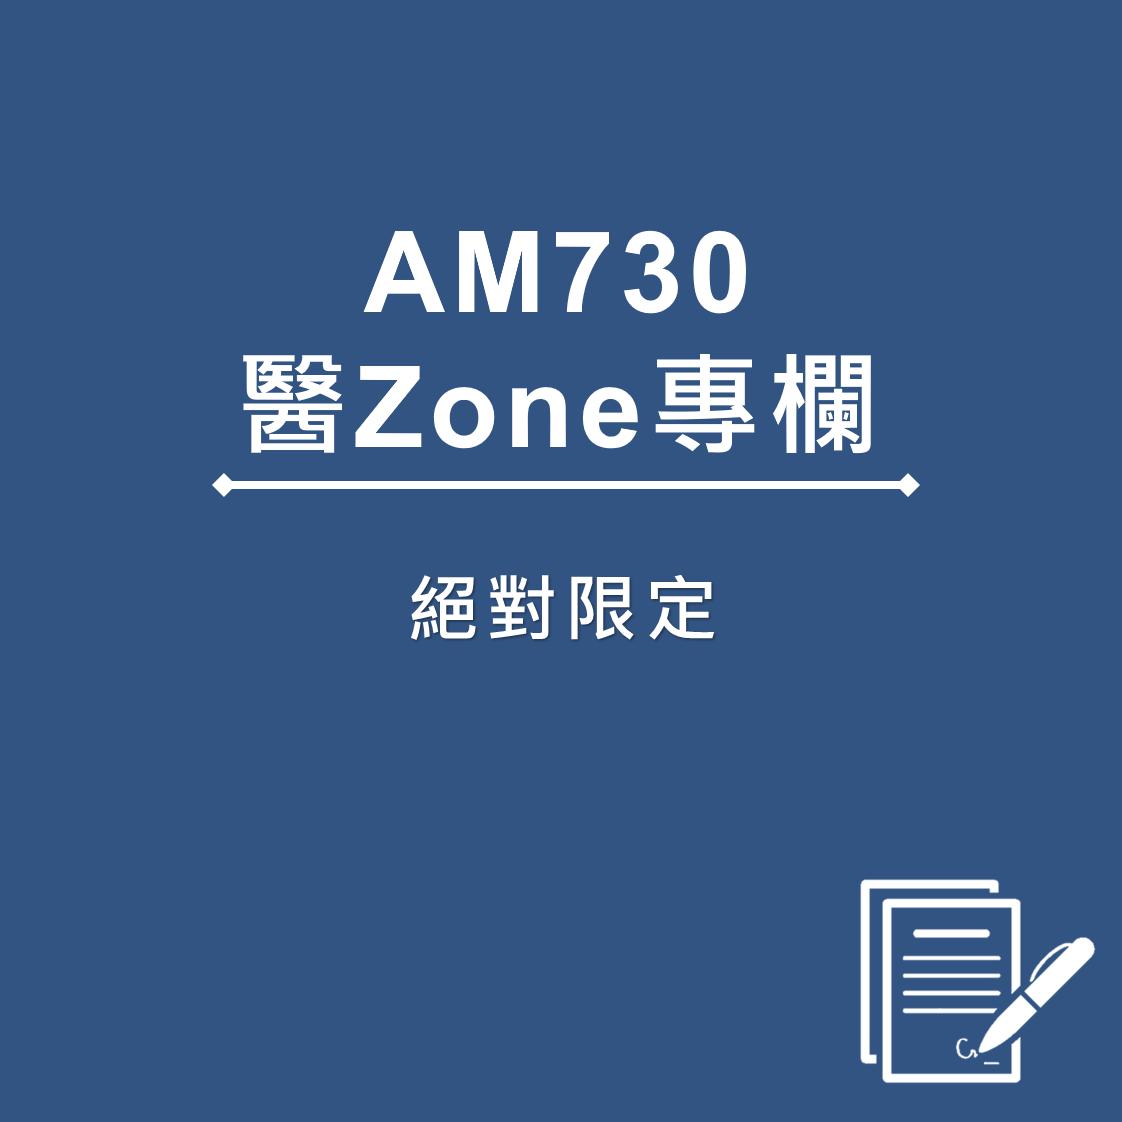 AM730 醫Zone 專欄 - 絕對限定